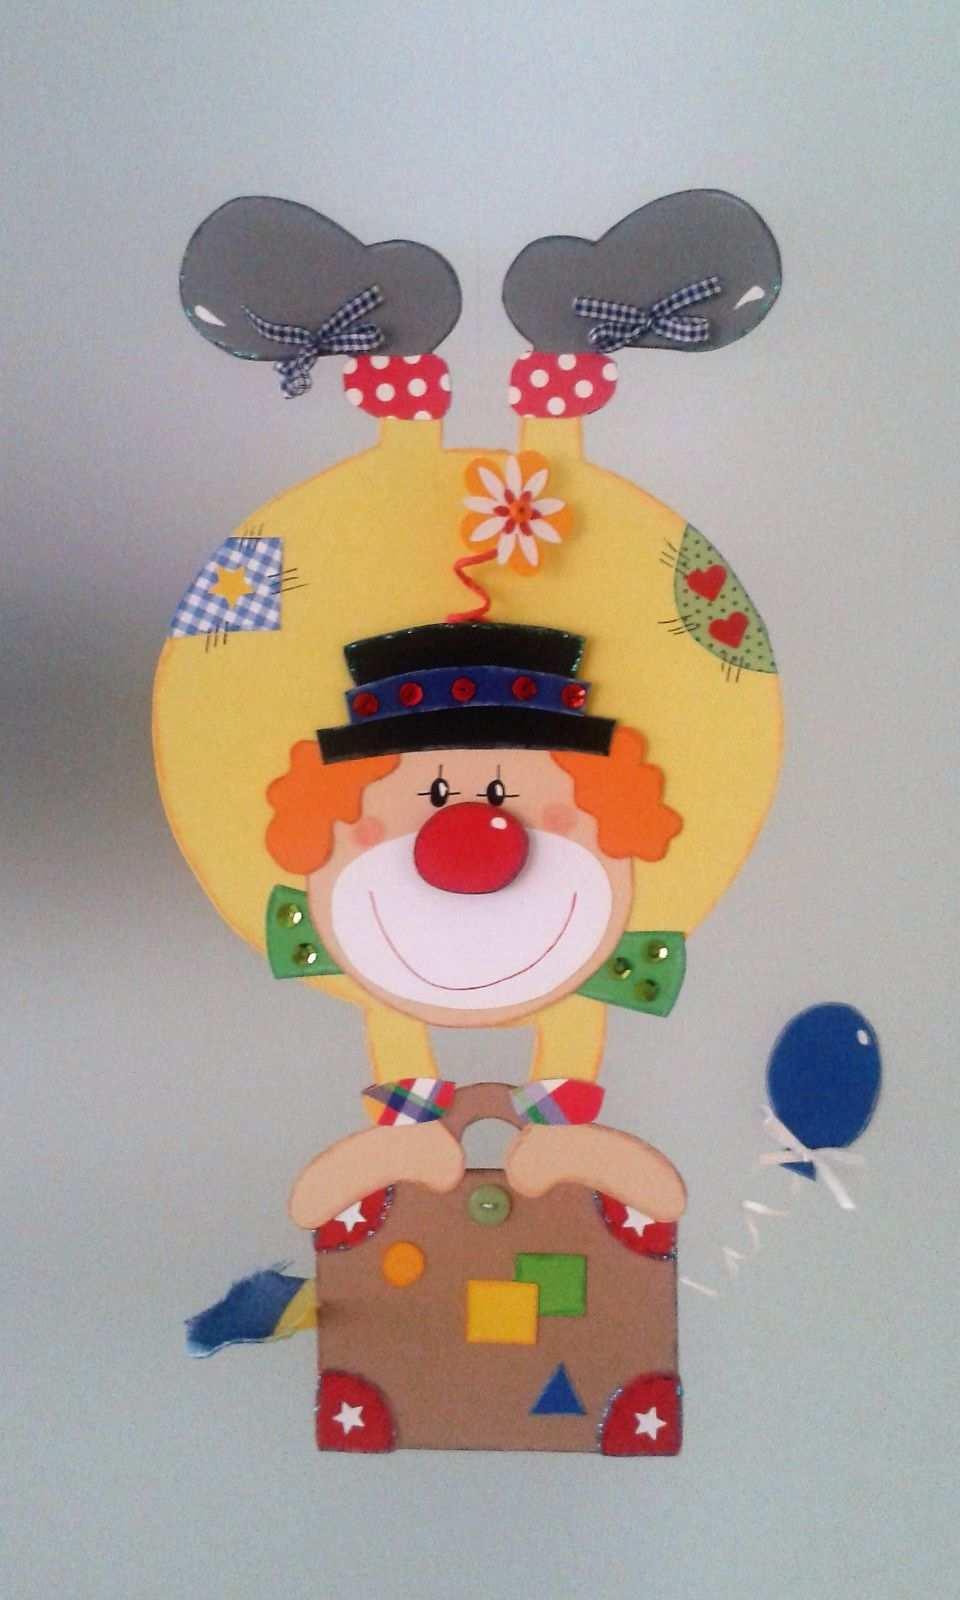 Fensterbild Clown Steht Kopf Fasching Karneval Dekoration Tonkarton For Karneval Basteln Dekoration Fasching Basteln Mit Kindern Clown Basteln Vorlage